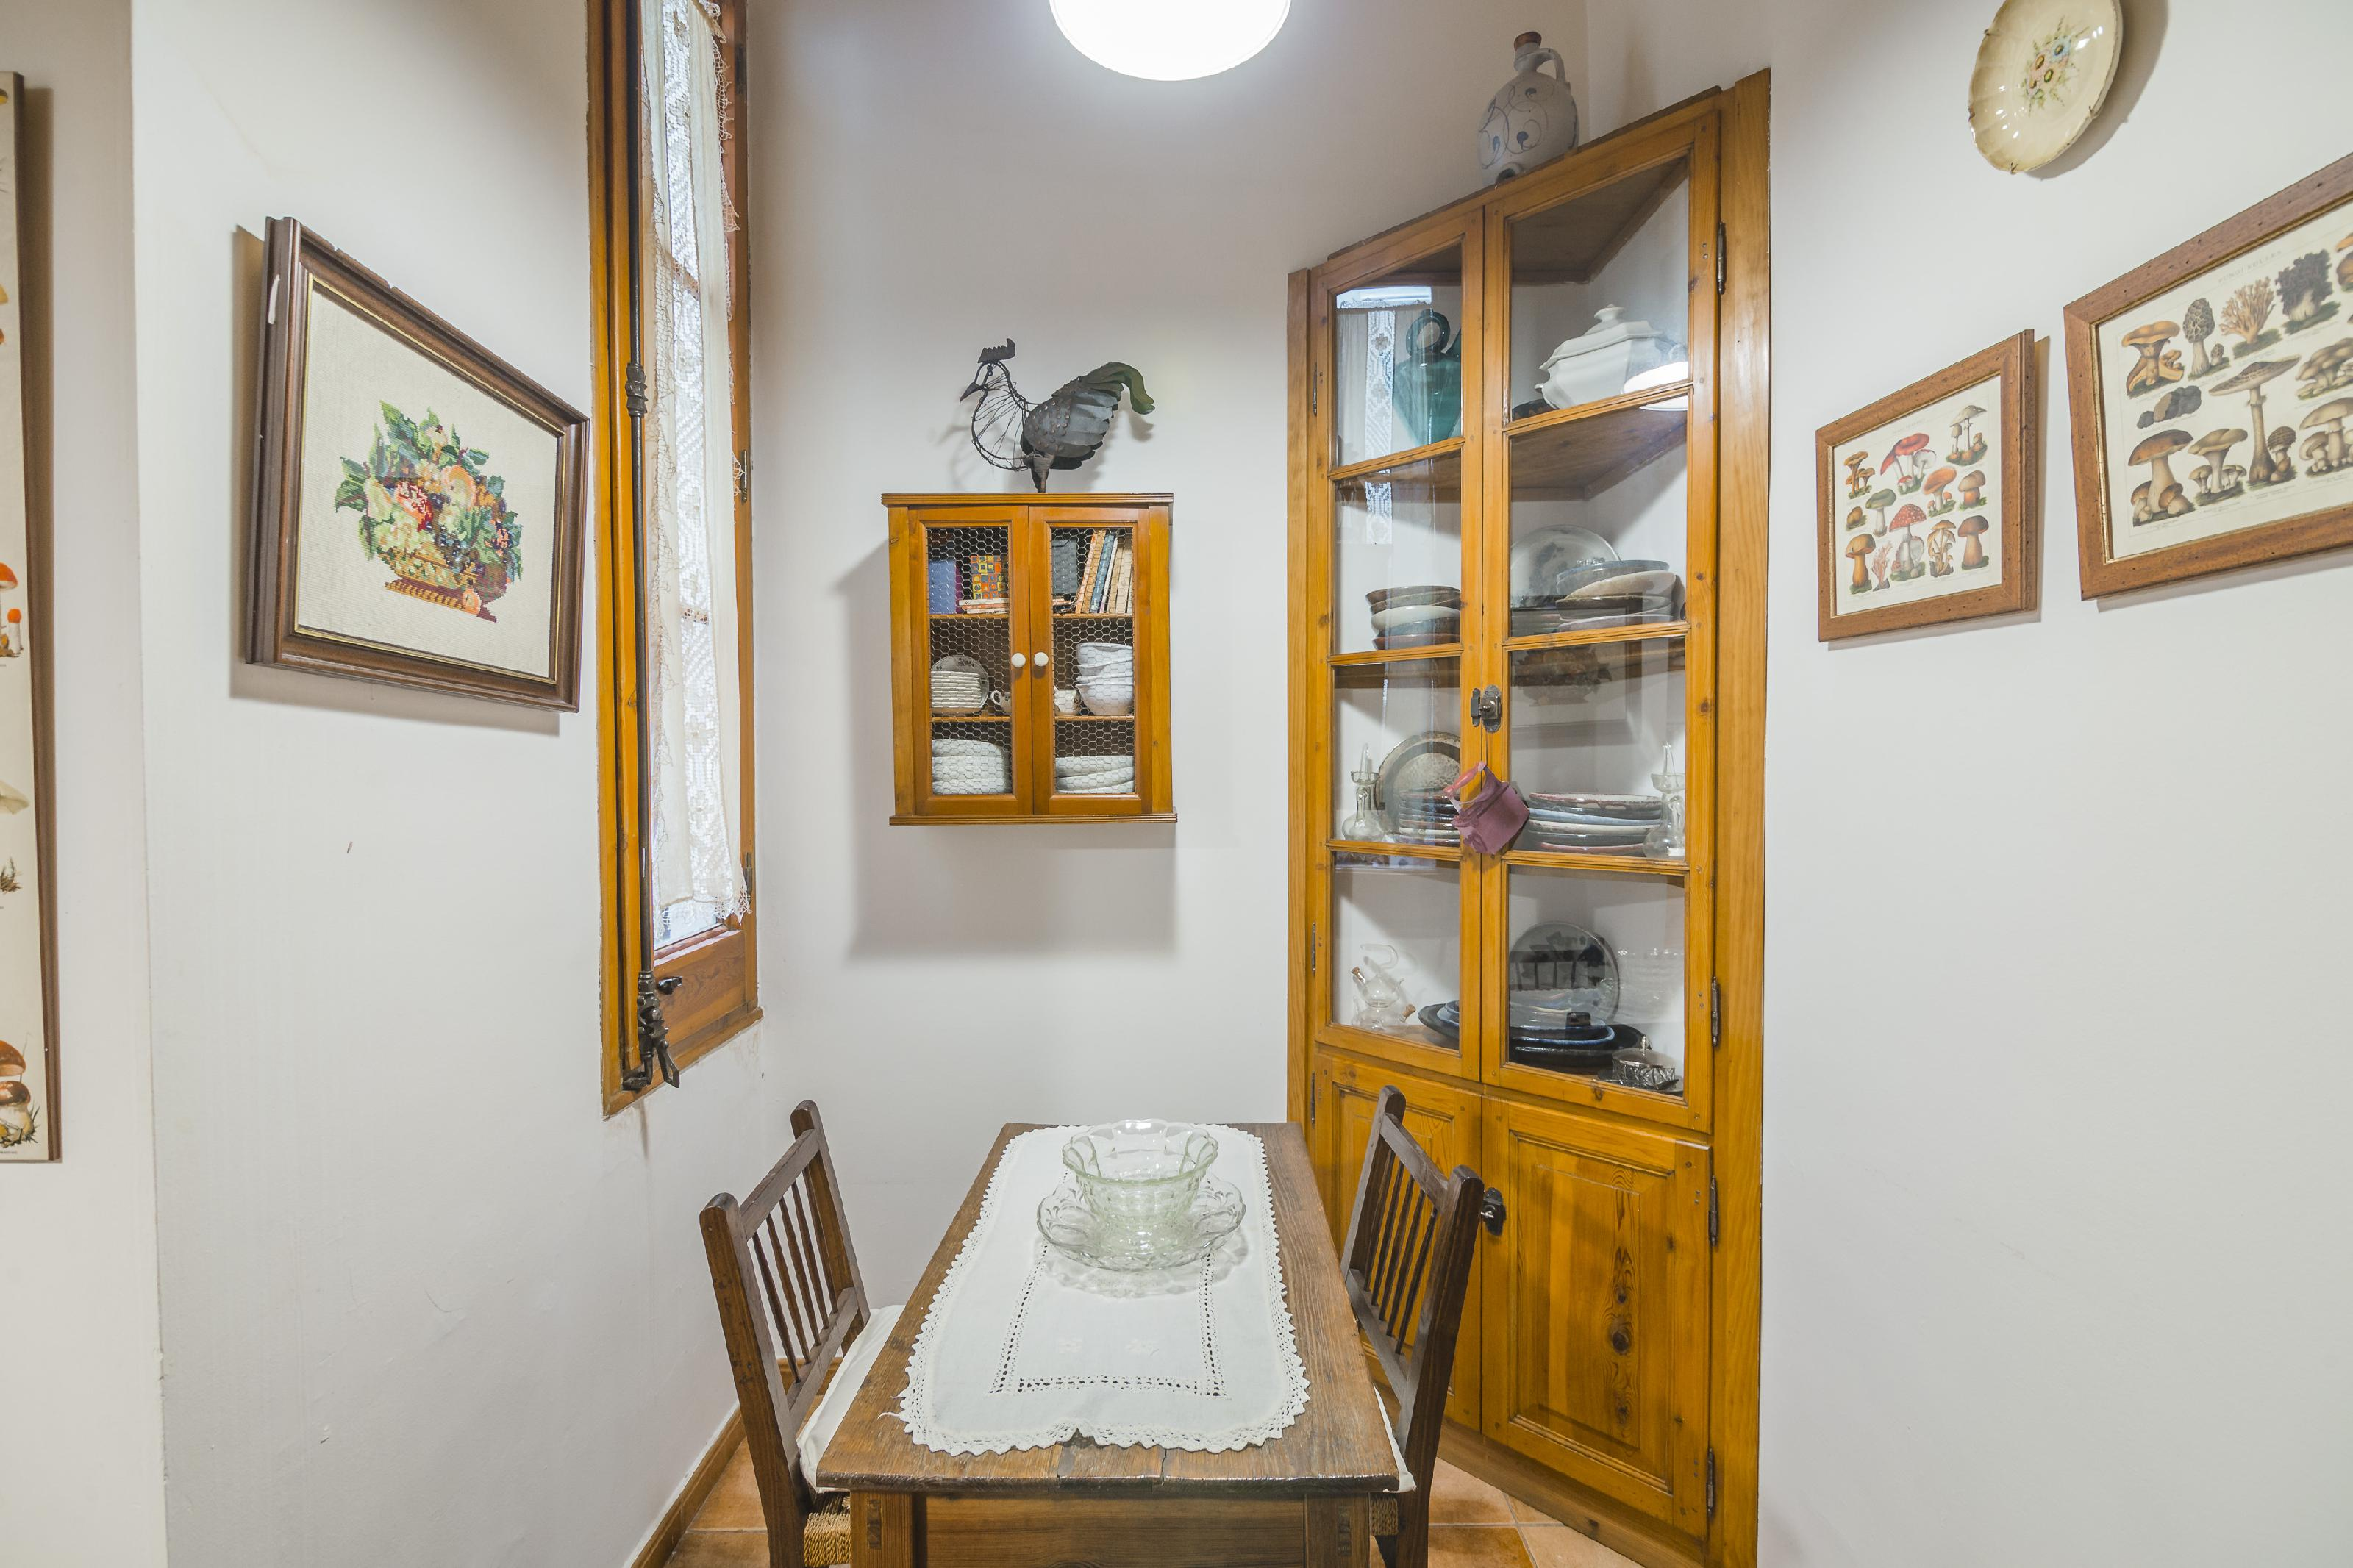 250020 Piso en venda en Gràcia, Vila de Gràcia 16